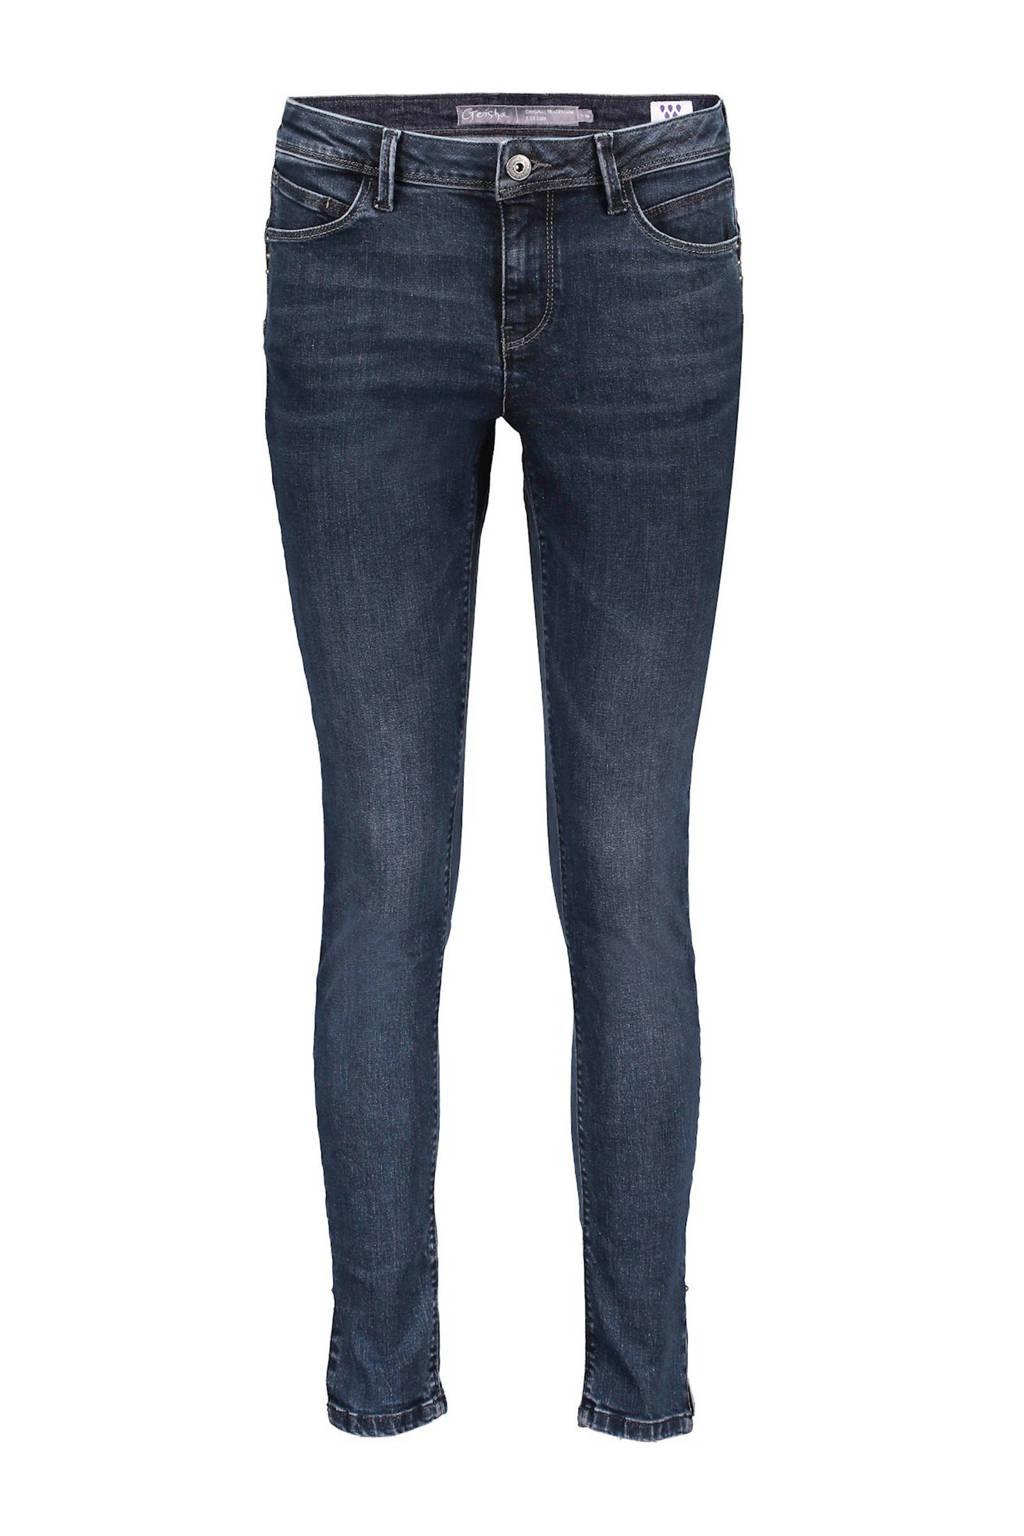 Geisha skinny jeans dark denim stonewashed, Dark denim stonewashed